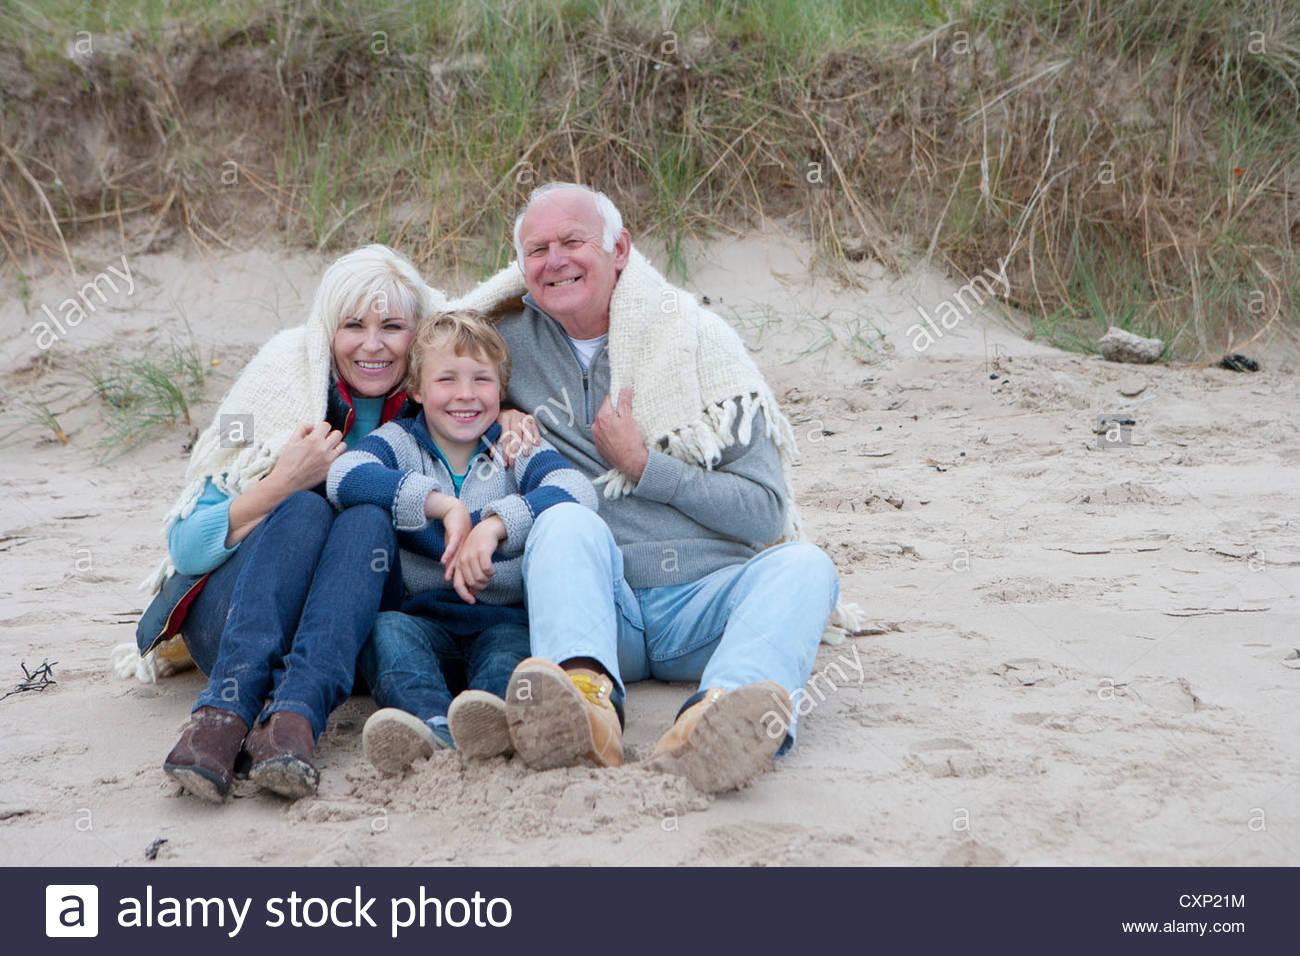 Grandparents And Grandson Sheltering Under Blanket On Beach - Stock Image